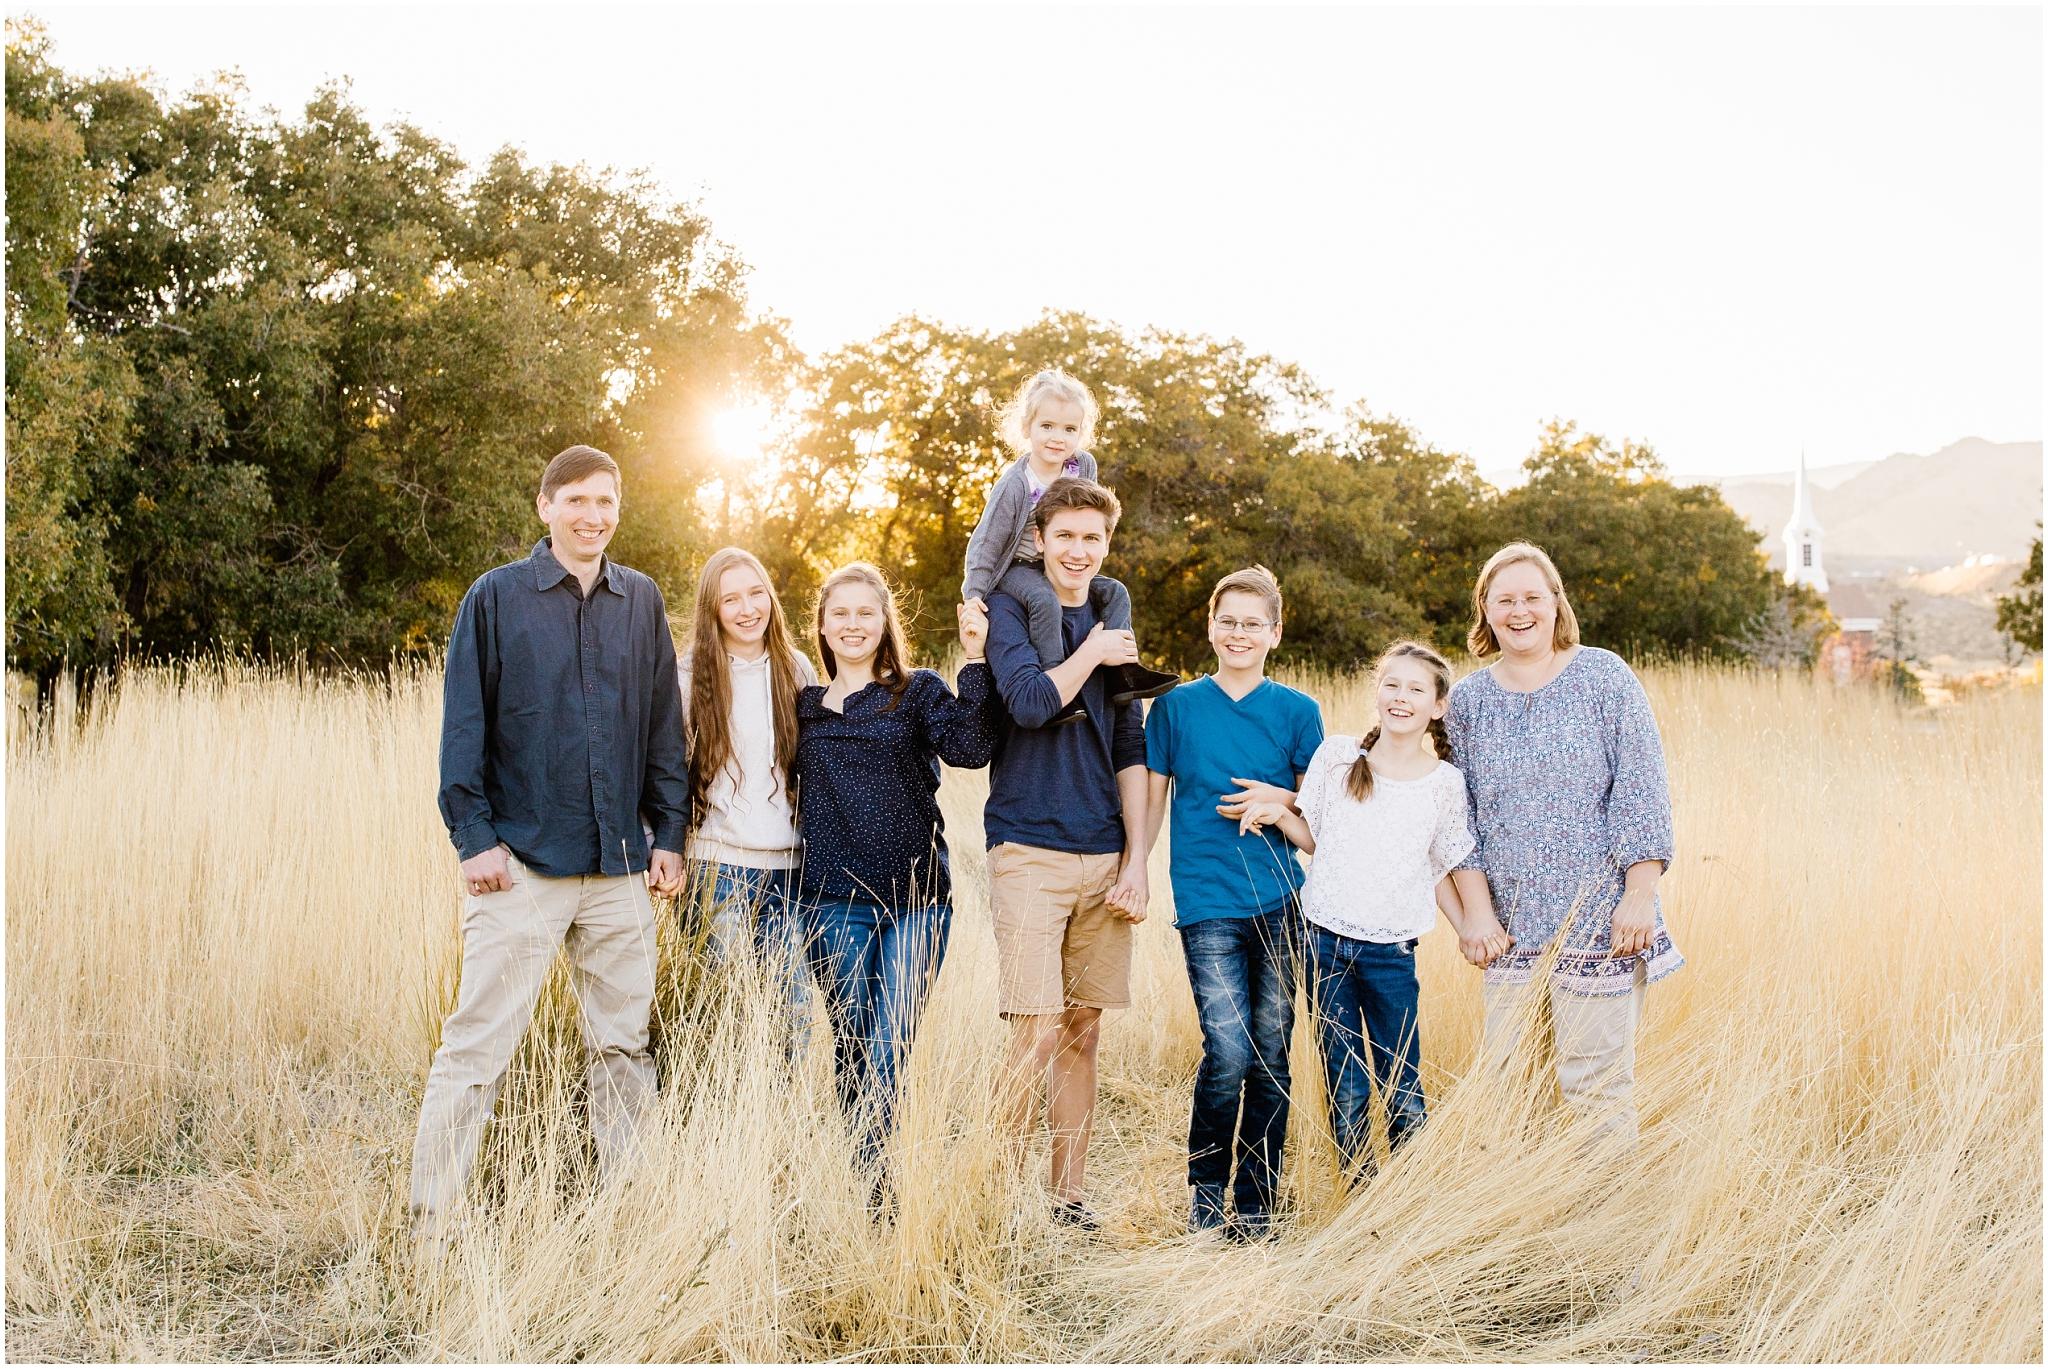 Jaursch-129_Lizzie-B-Imagery-Utah-Family-Photographer-Salt-Lake-City-Park-City-Herriman-Utah-County.jpg